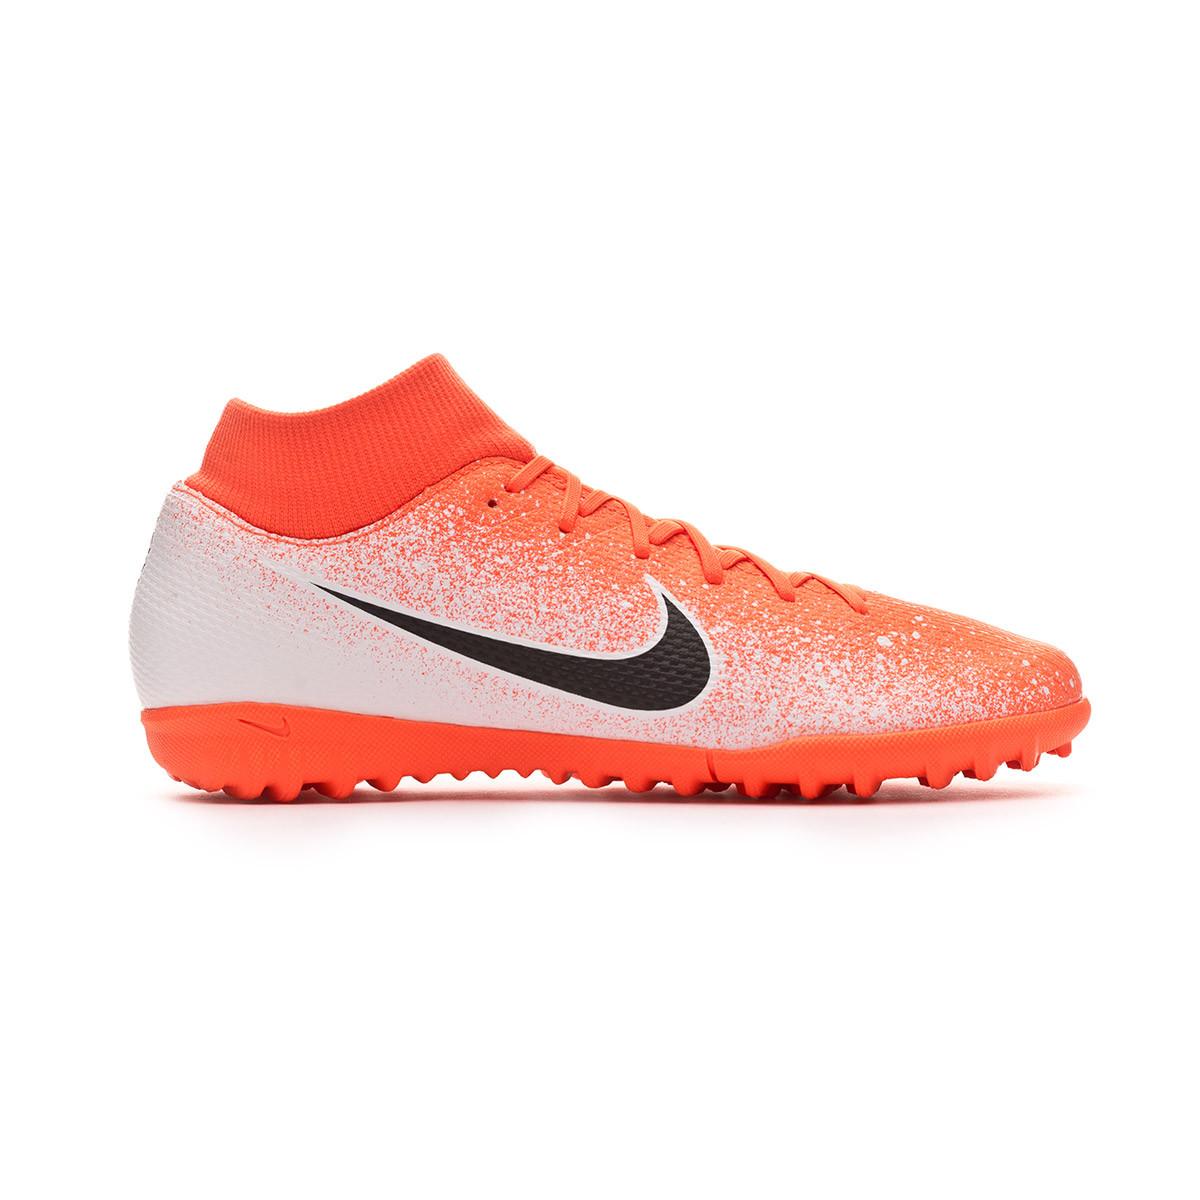 7746485c87e Football Boot Nike Mercurial SuperflyX VI Academy Turf Hyper  crimson-Black-White - Football store Fútbol Emotion